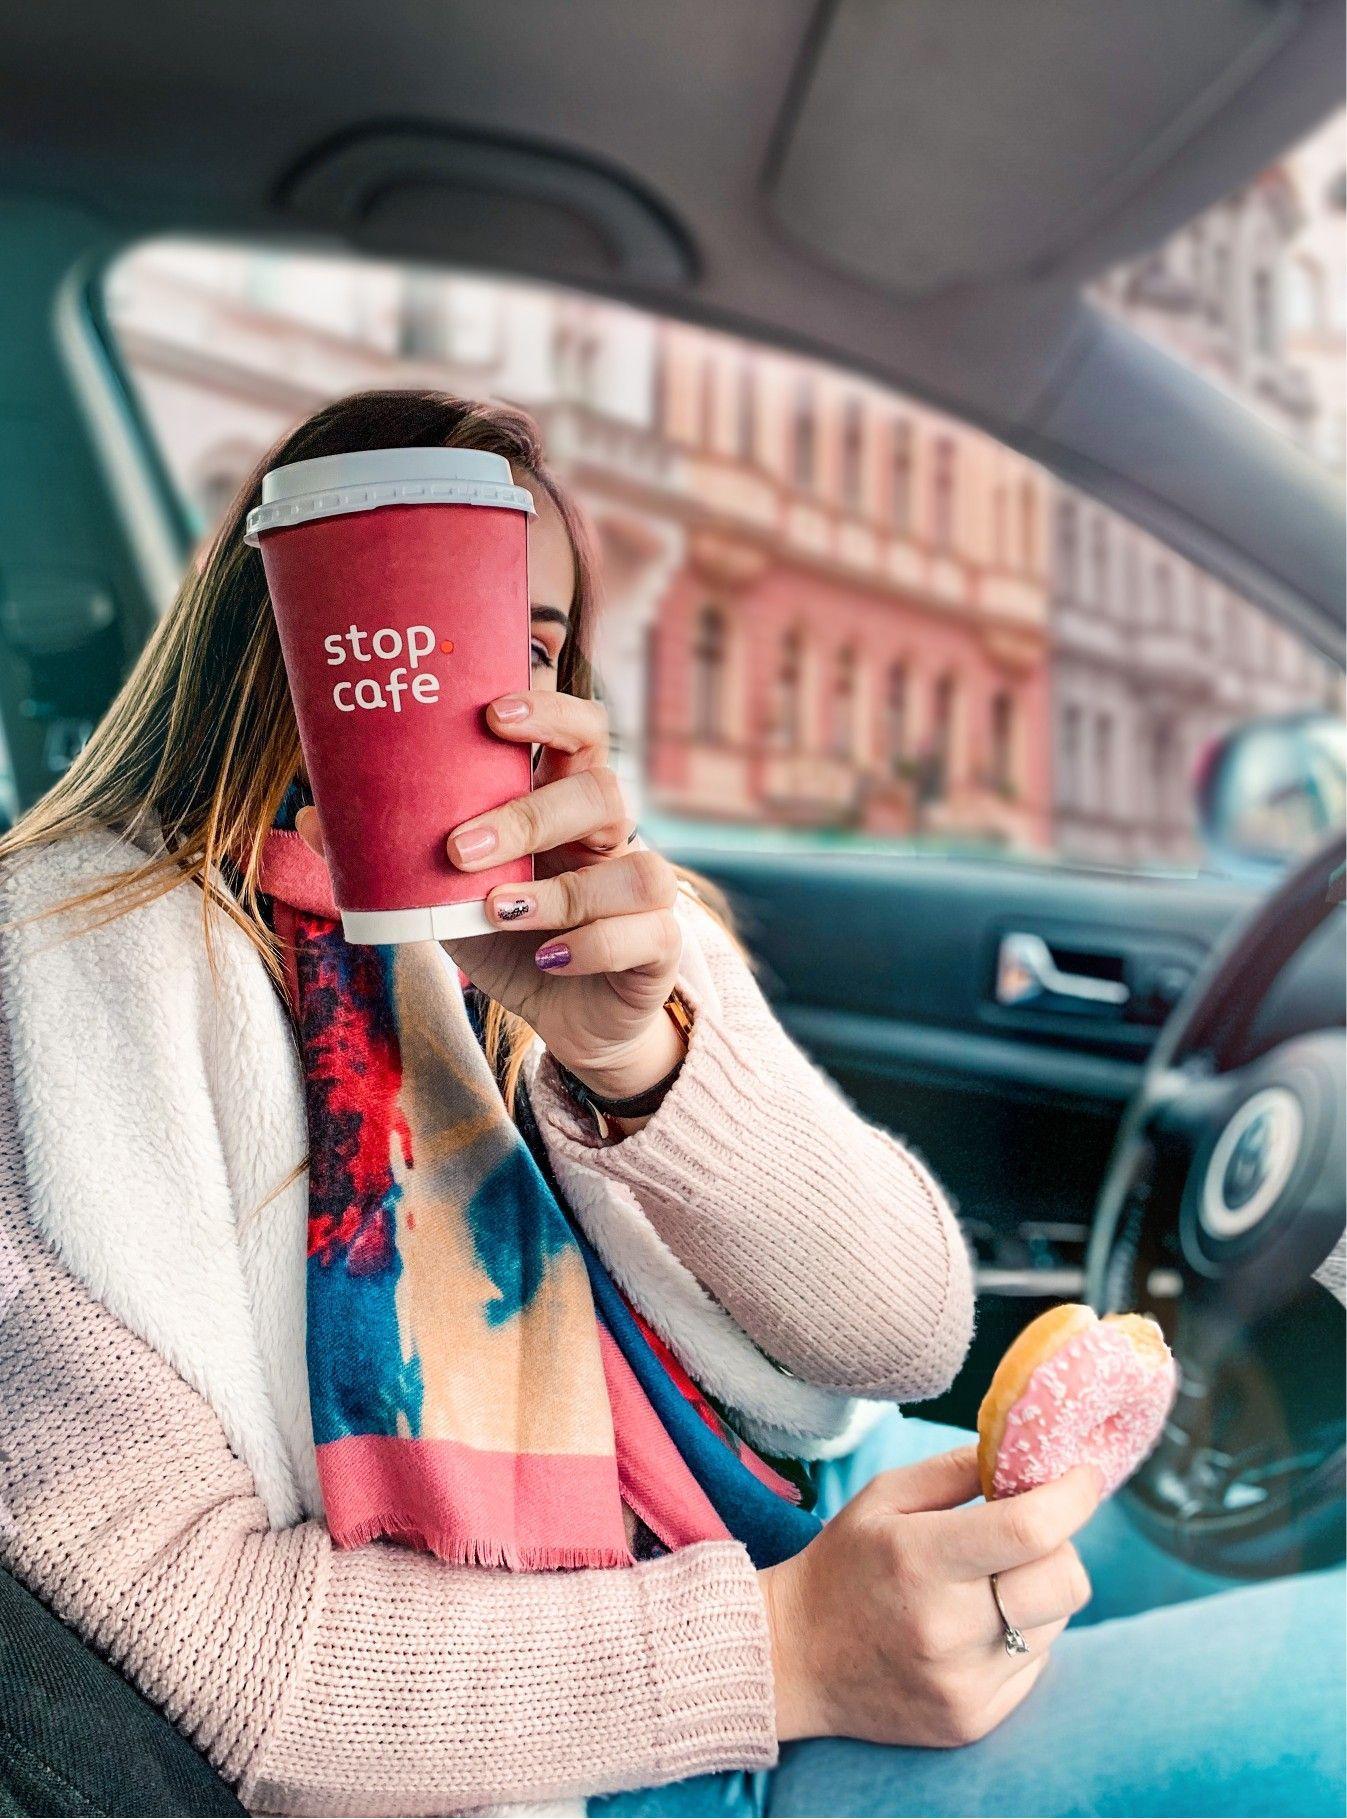 #photoideas #car #donut #winter #sweet #instaphoto #pink